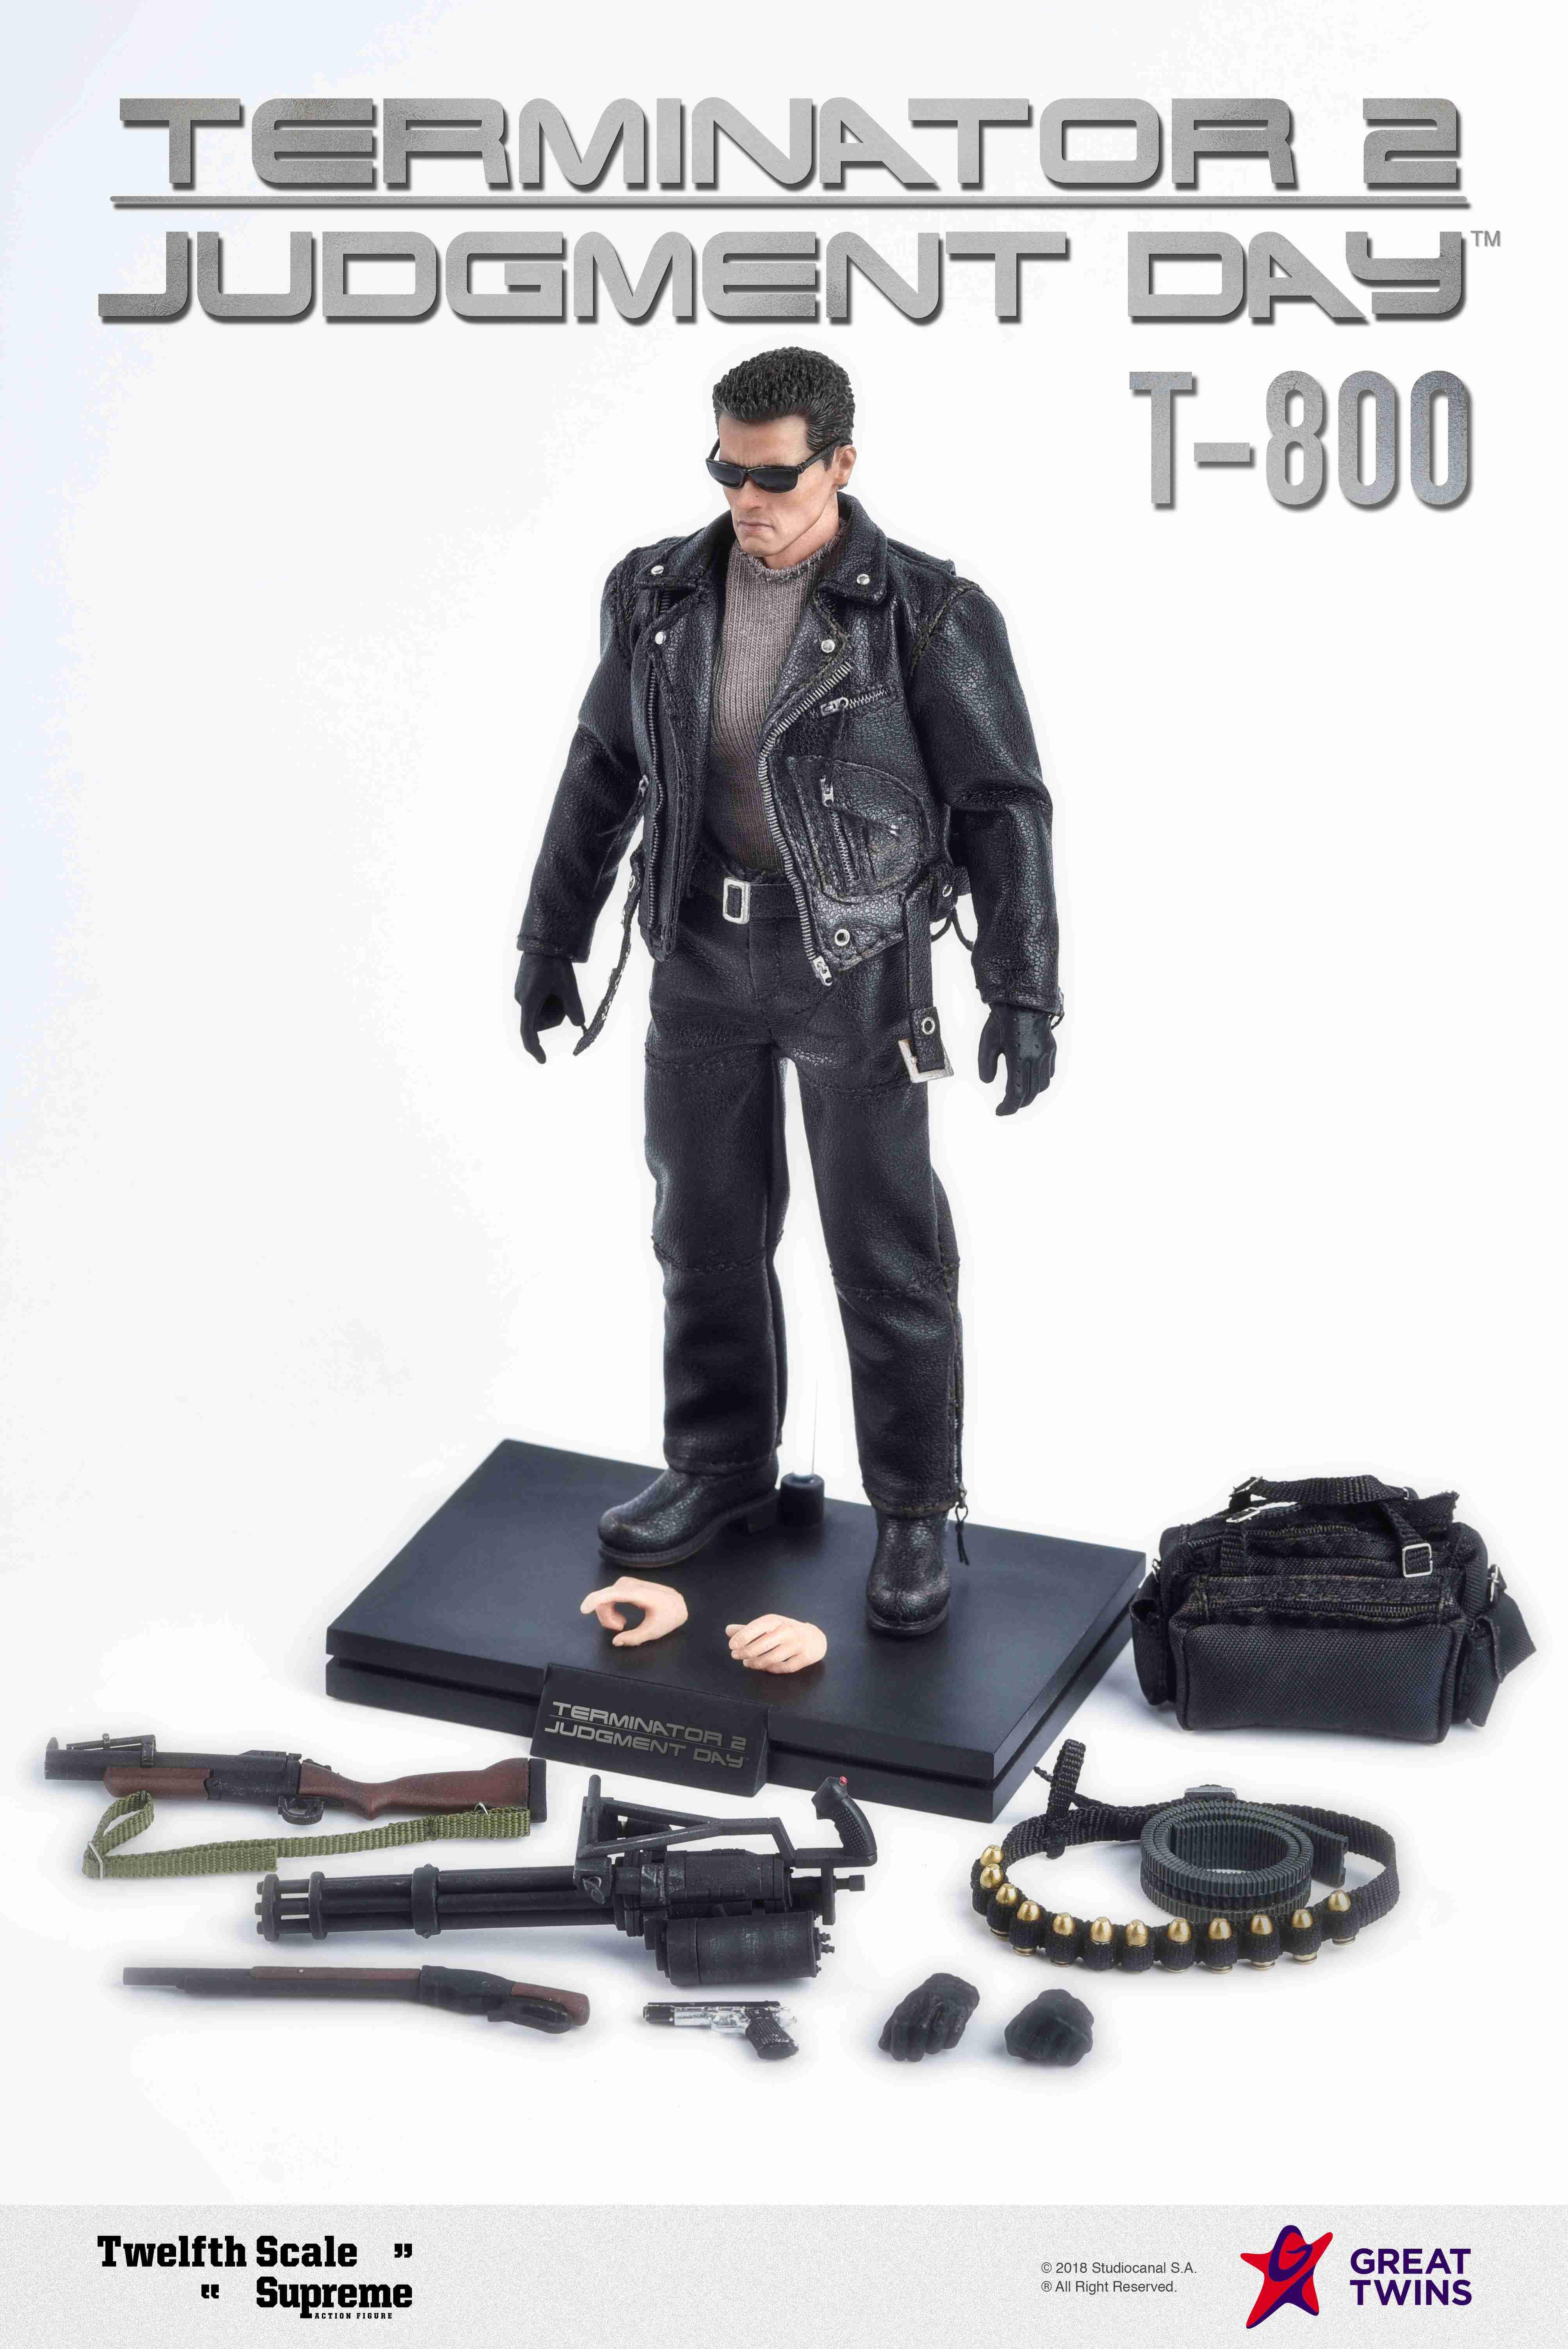 Twelfth Scale Supreme Action Figure (Terminator 2 Movie - T-800)_8